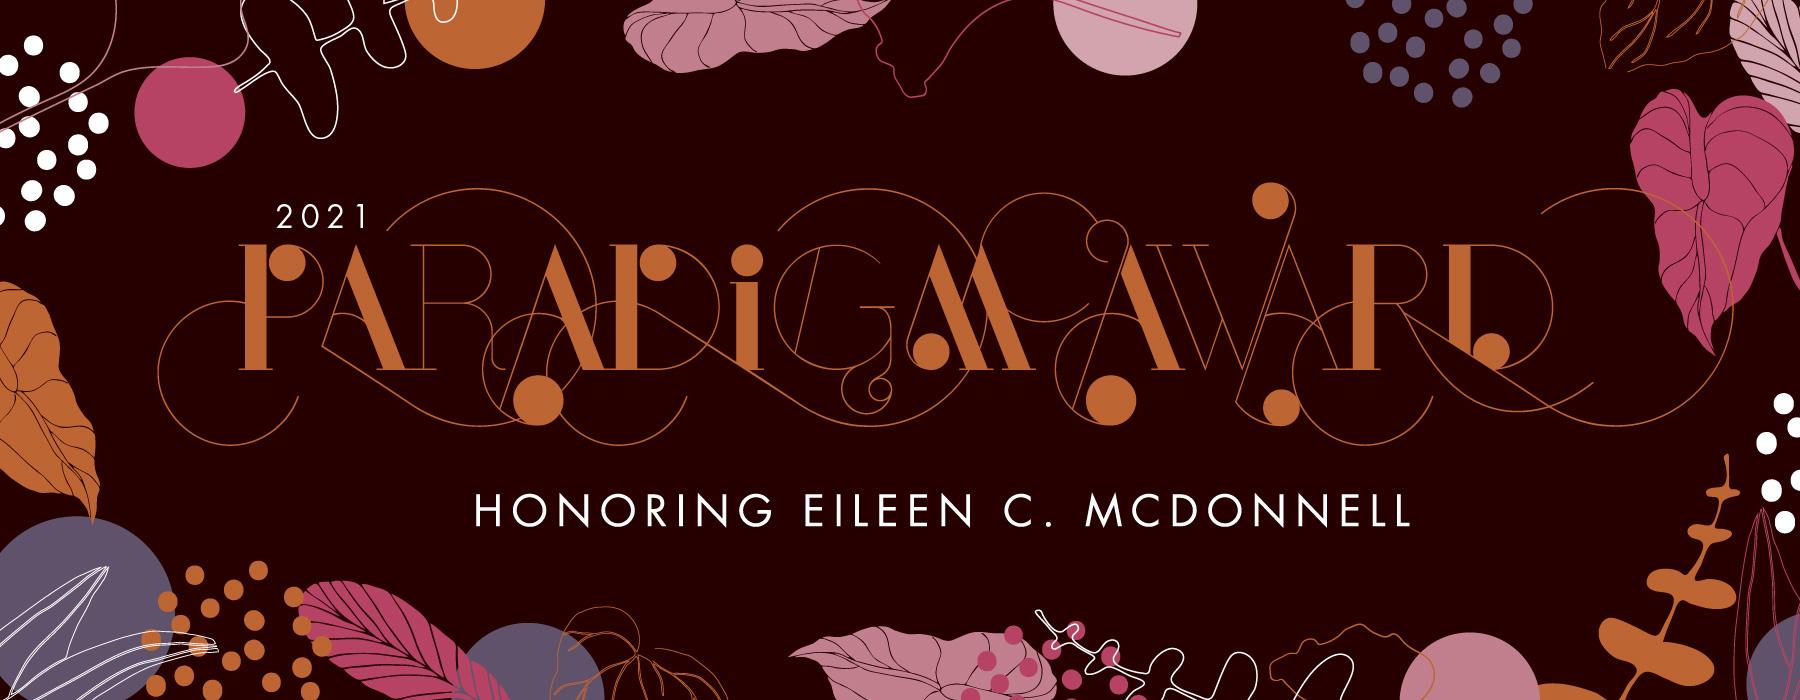 Paradigm Award Honoring Eileen C. McDonnell